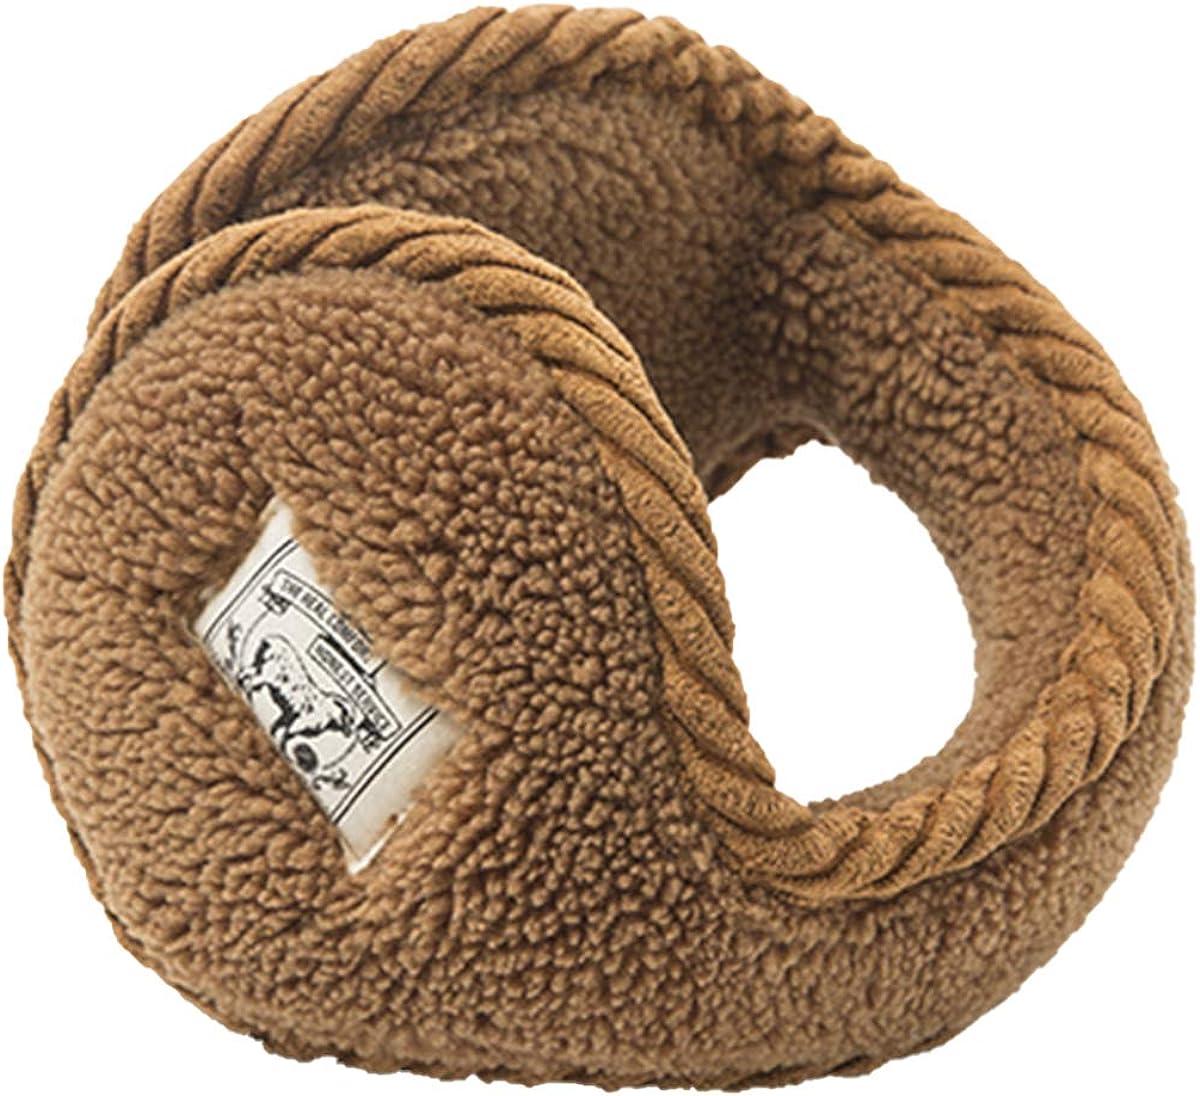 Unisex Winter Ear Muffs Ear Warmers Earmuffs Foldable Ear Covers Classic Fleece Warm Earmuffs for Cycling Running